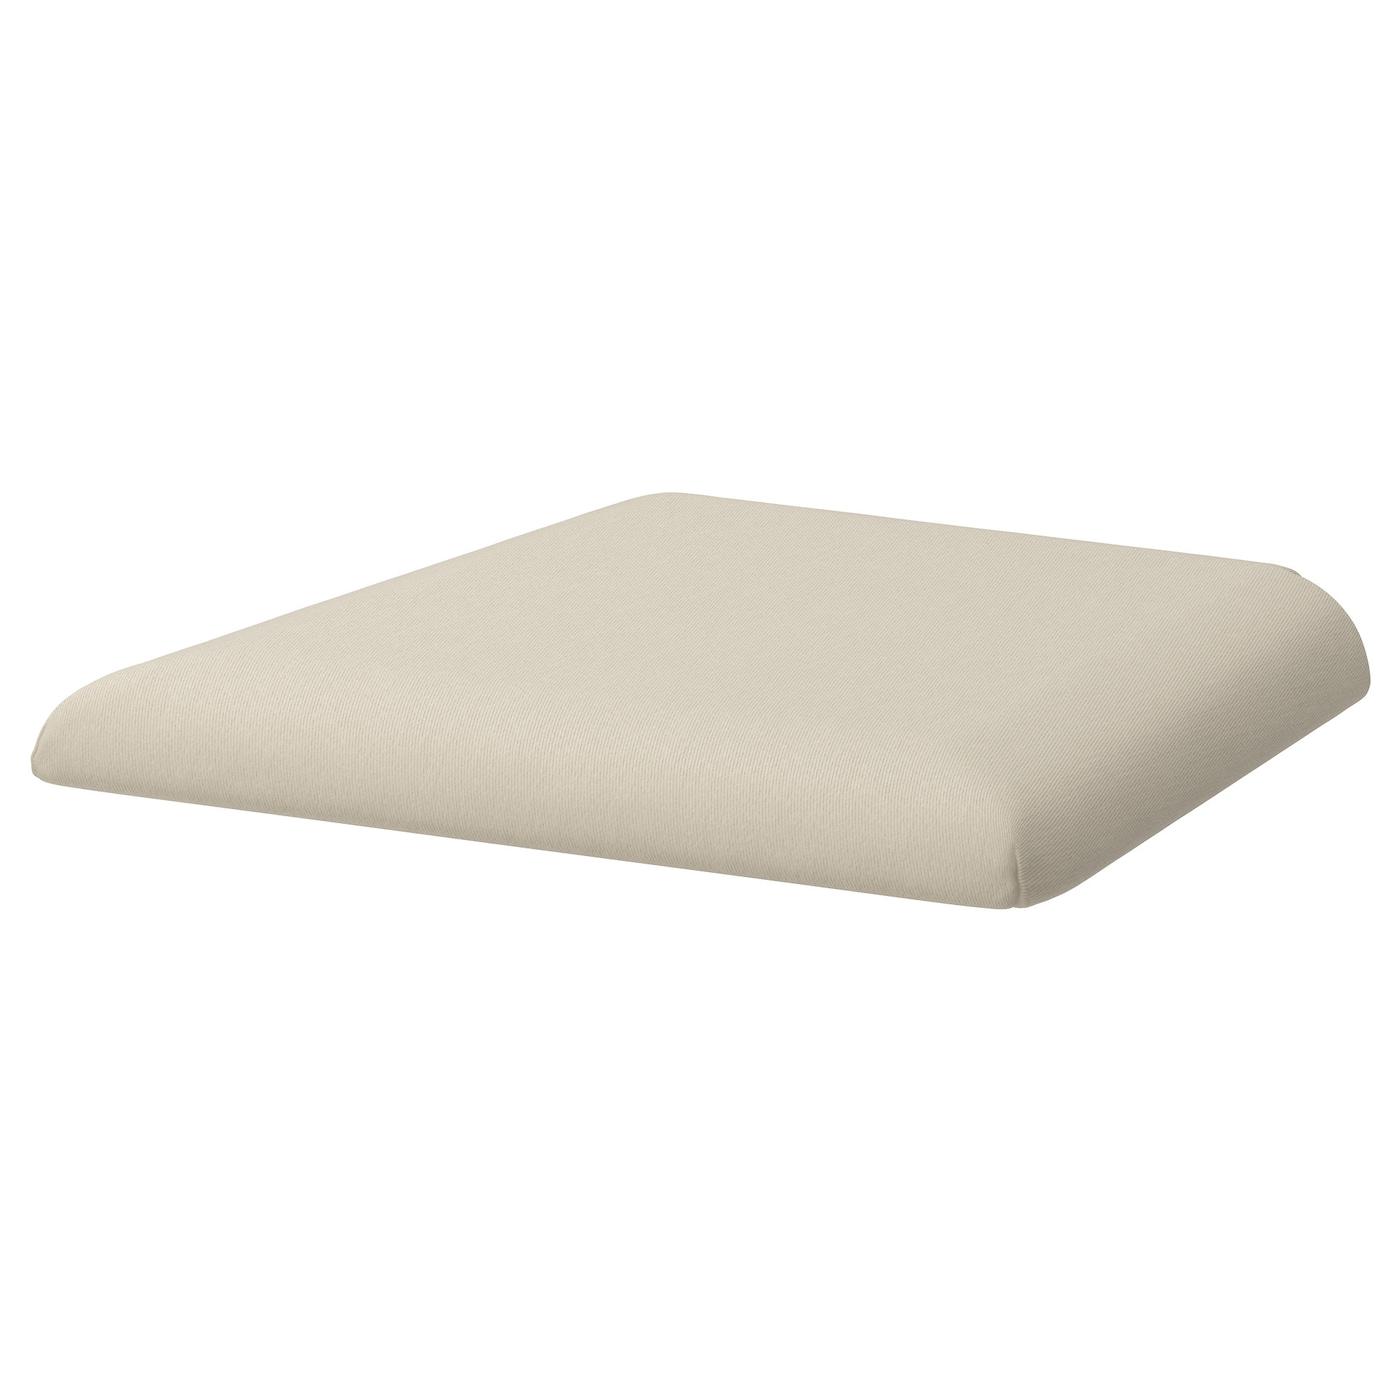 lerhamn housse pour chaise vittaryd beige ikea. Black Bedroom Furniture Sets. Home Design Ideas